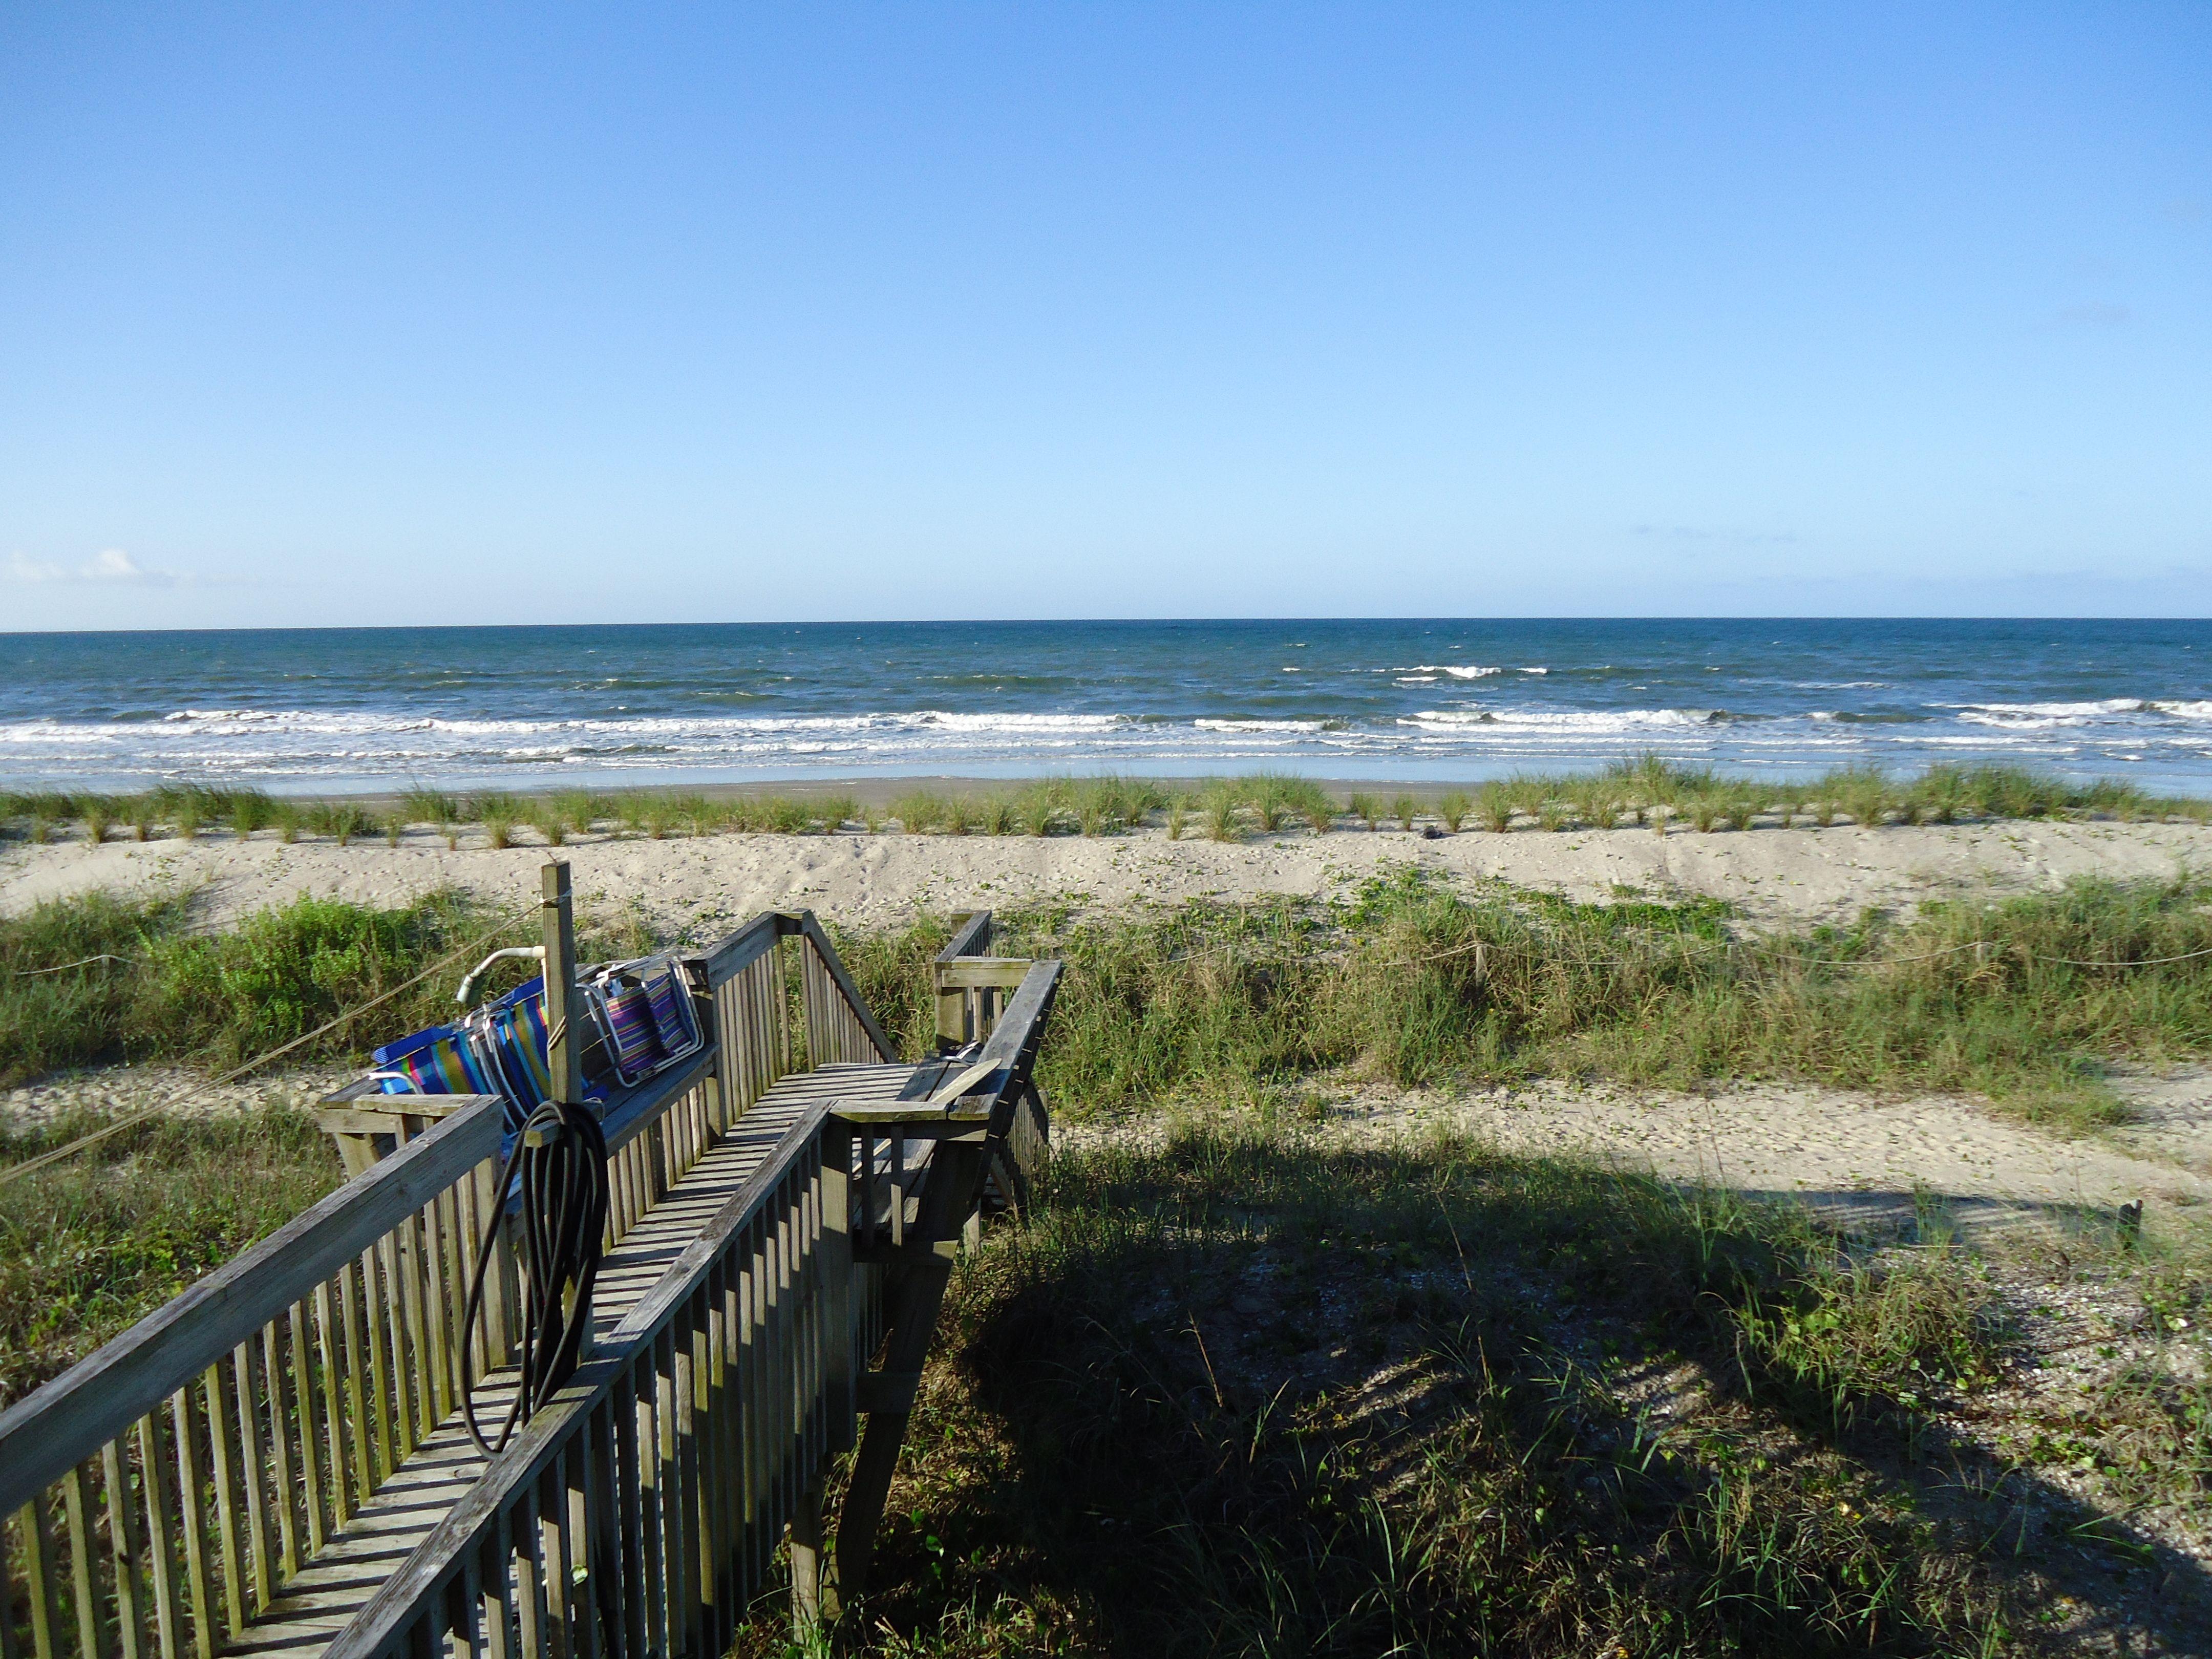 Long beach lighthouse wedding  Oak Island North Carolina  Oak Island or Long Beach NC  Pinterest